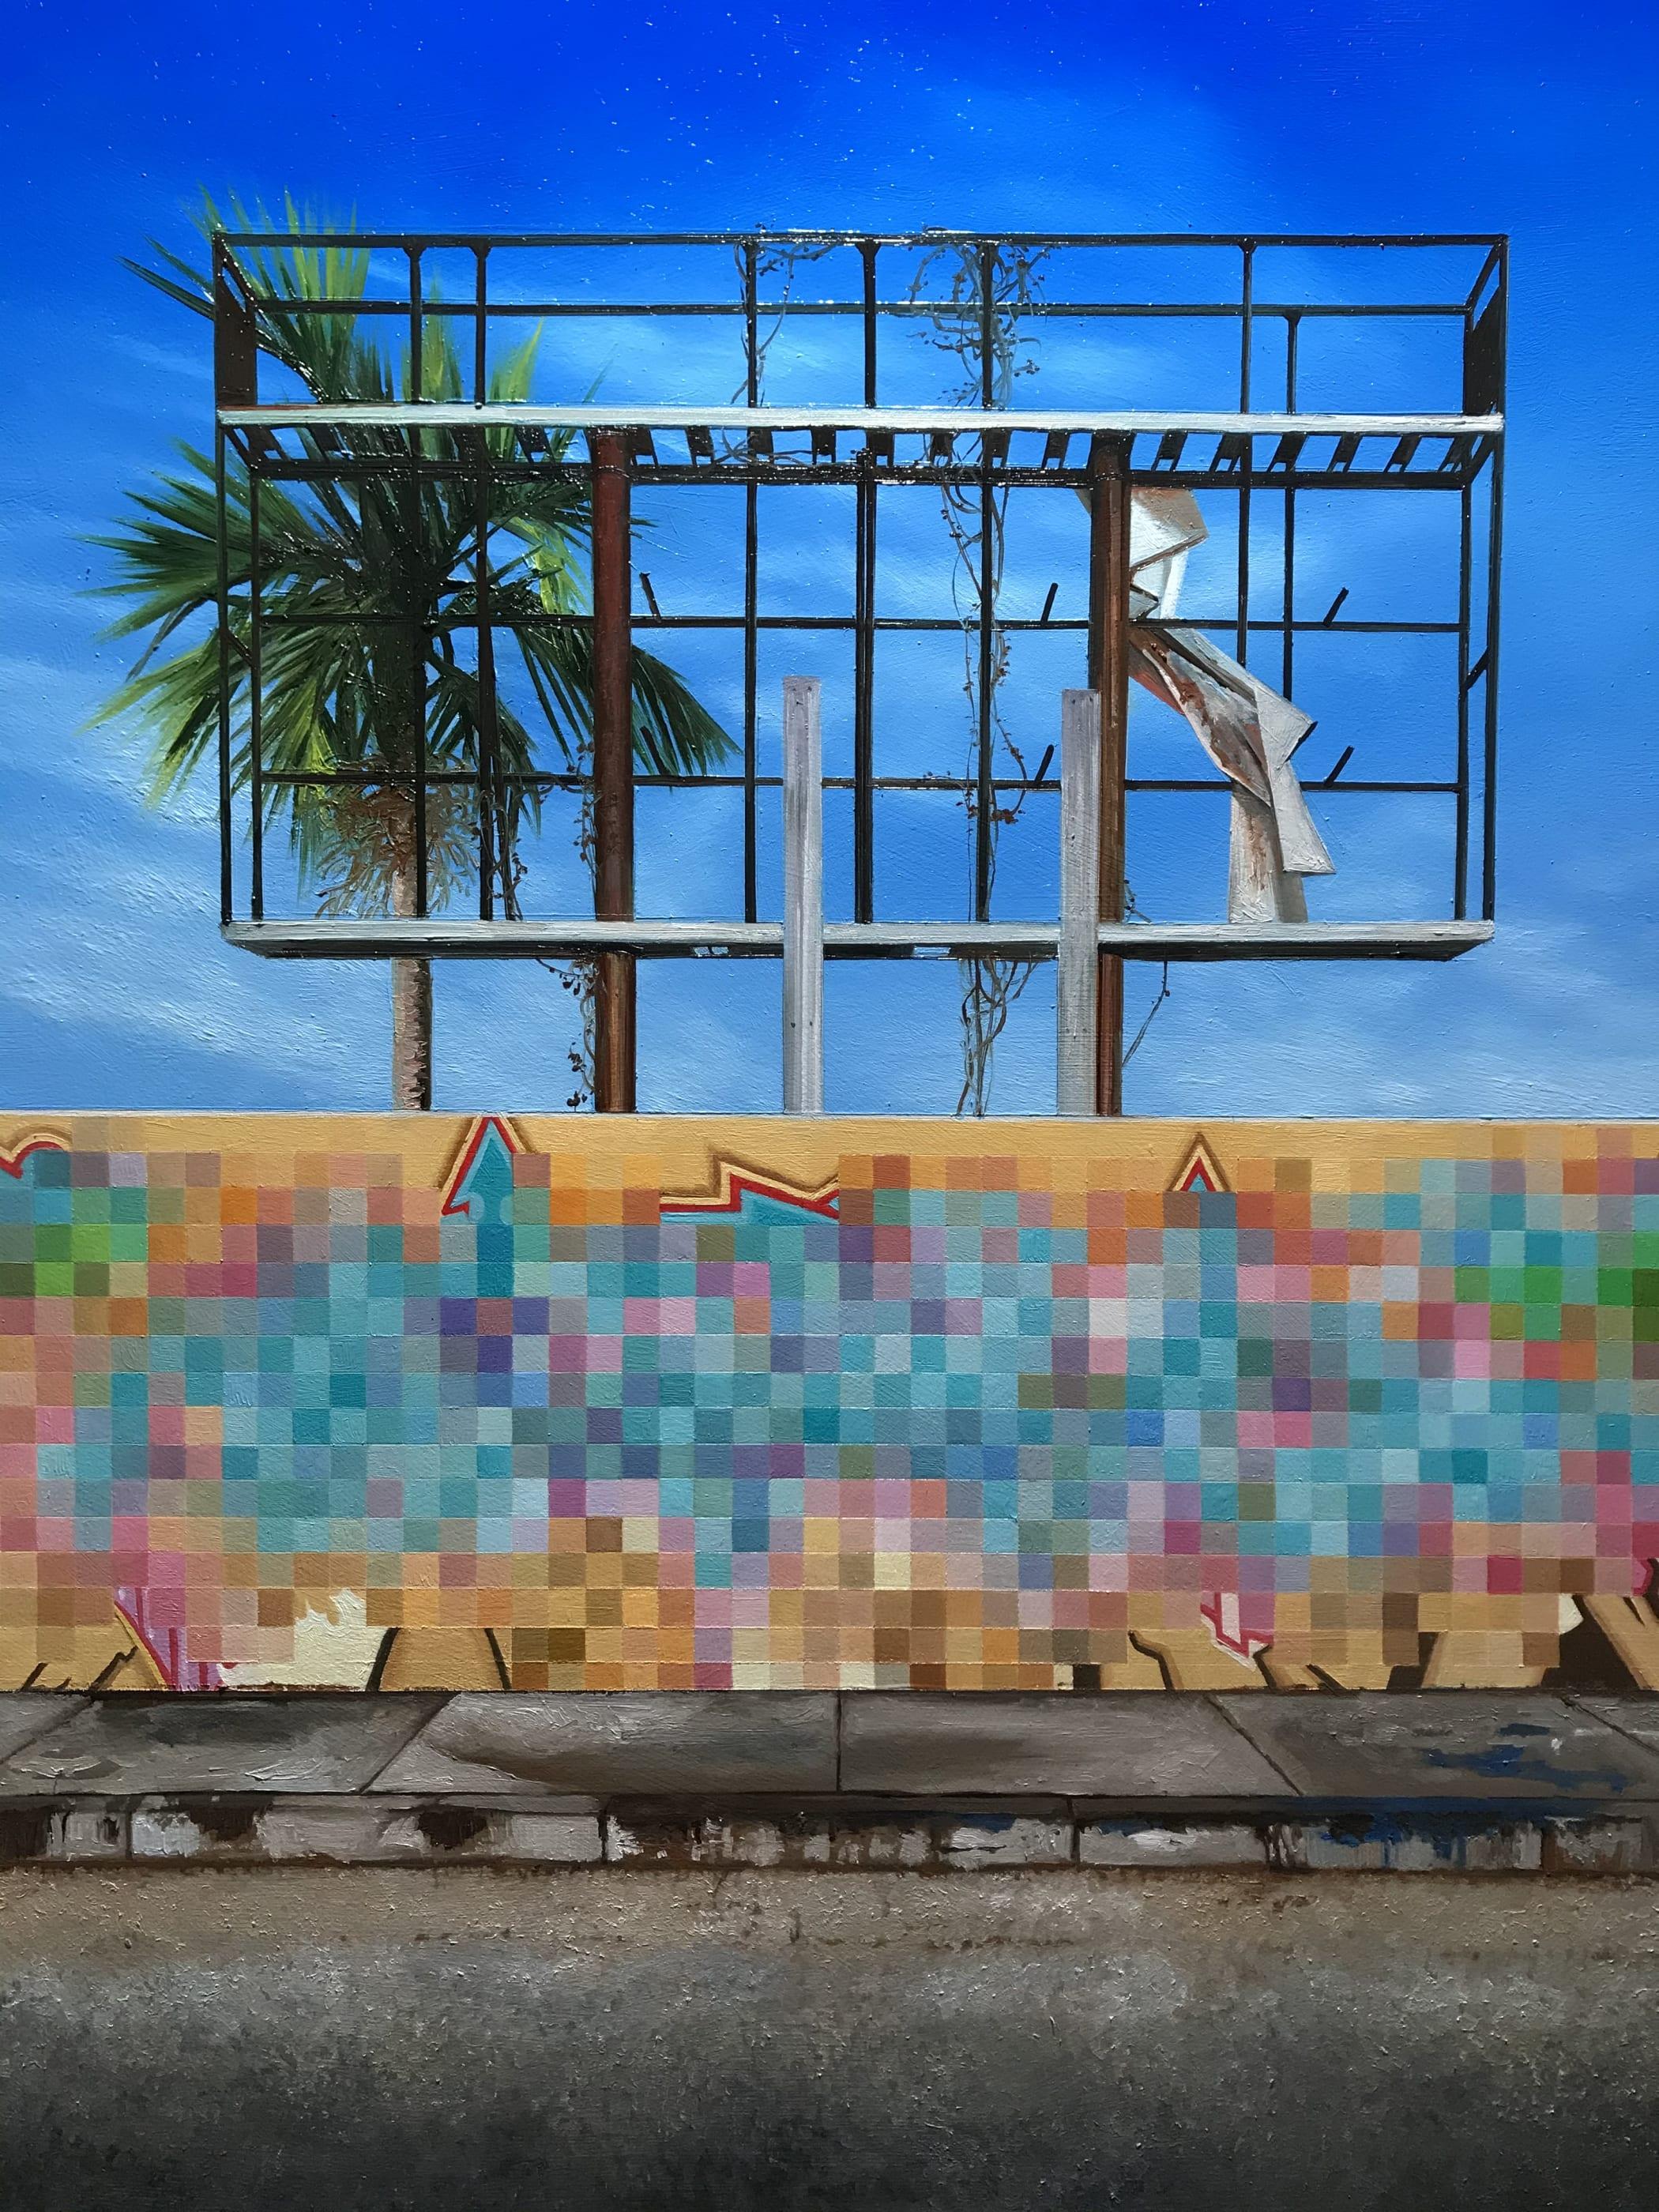 Jessica Hess, Miami Pixels, 2019